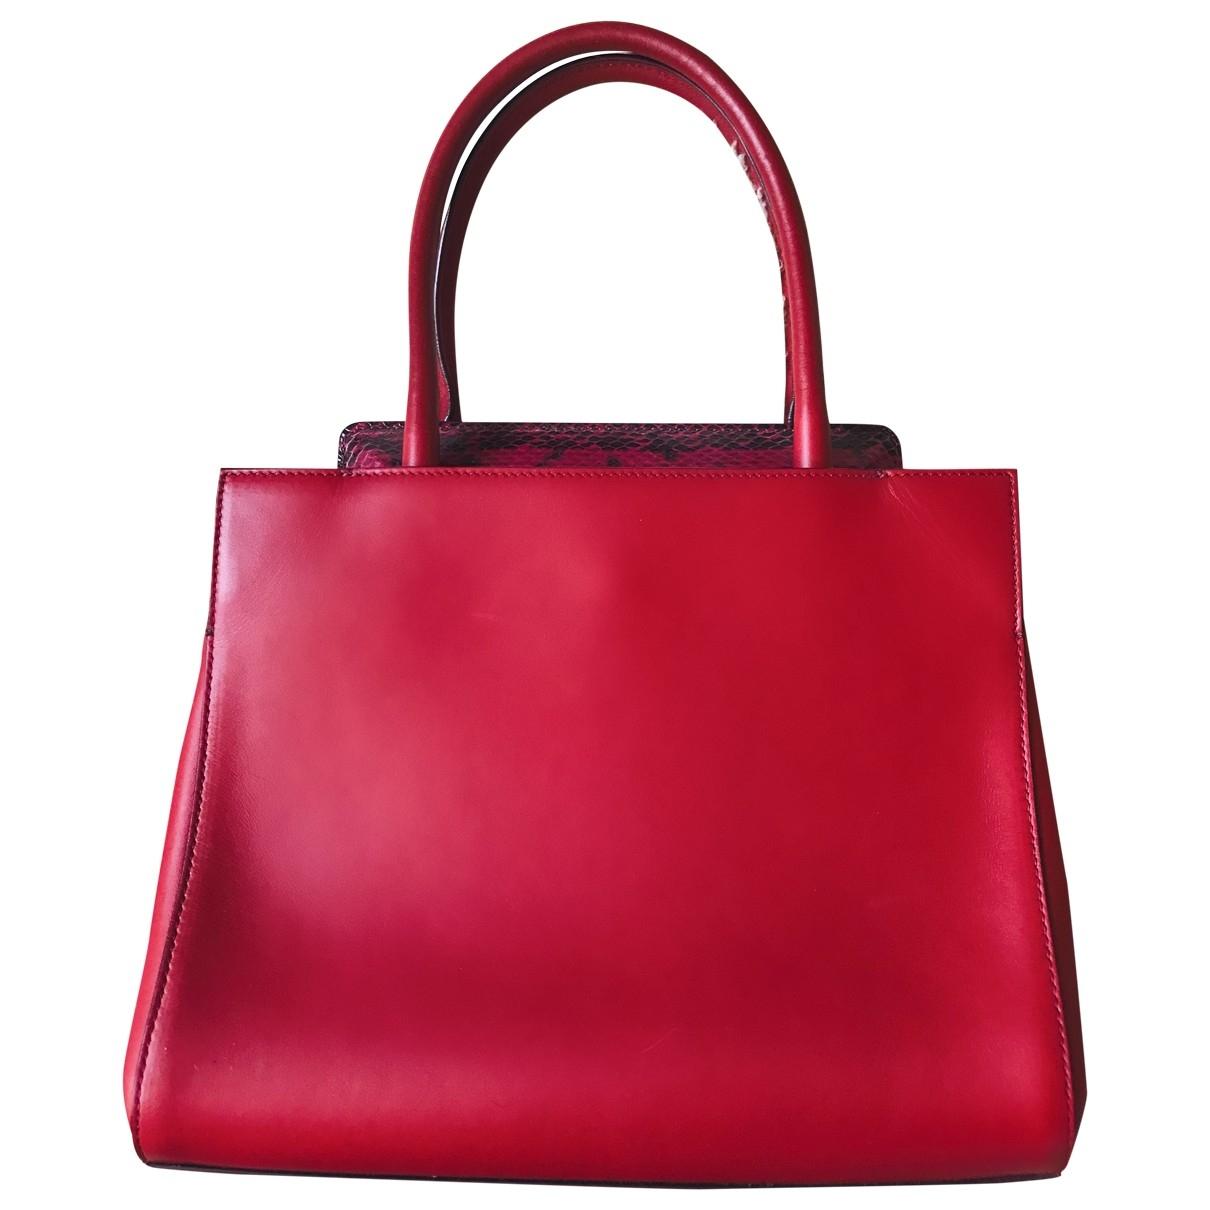 Max Mara \N Red Leather handbag for Women \N